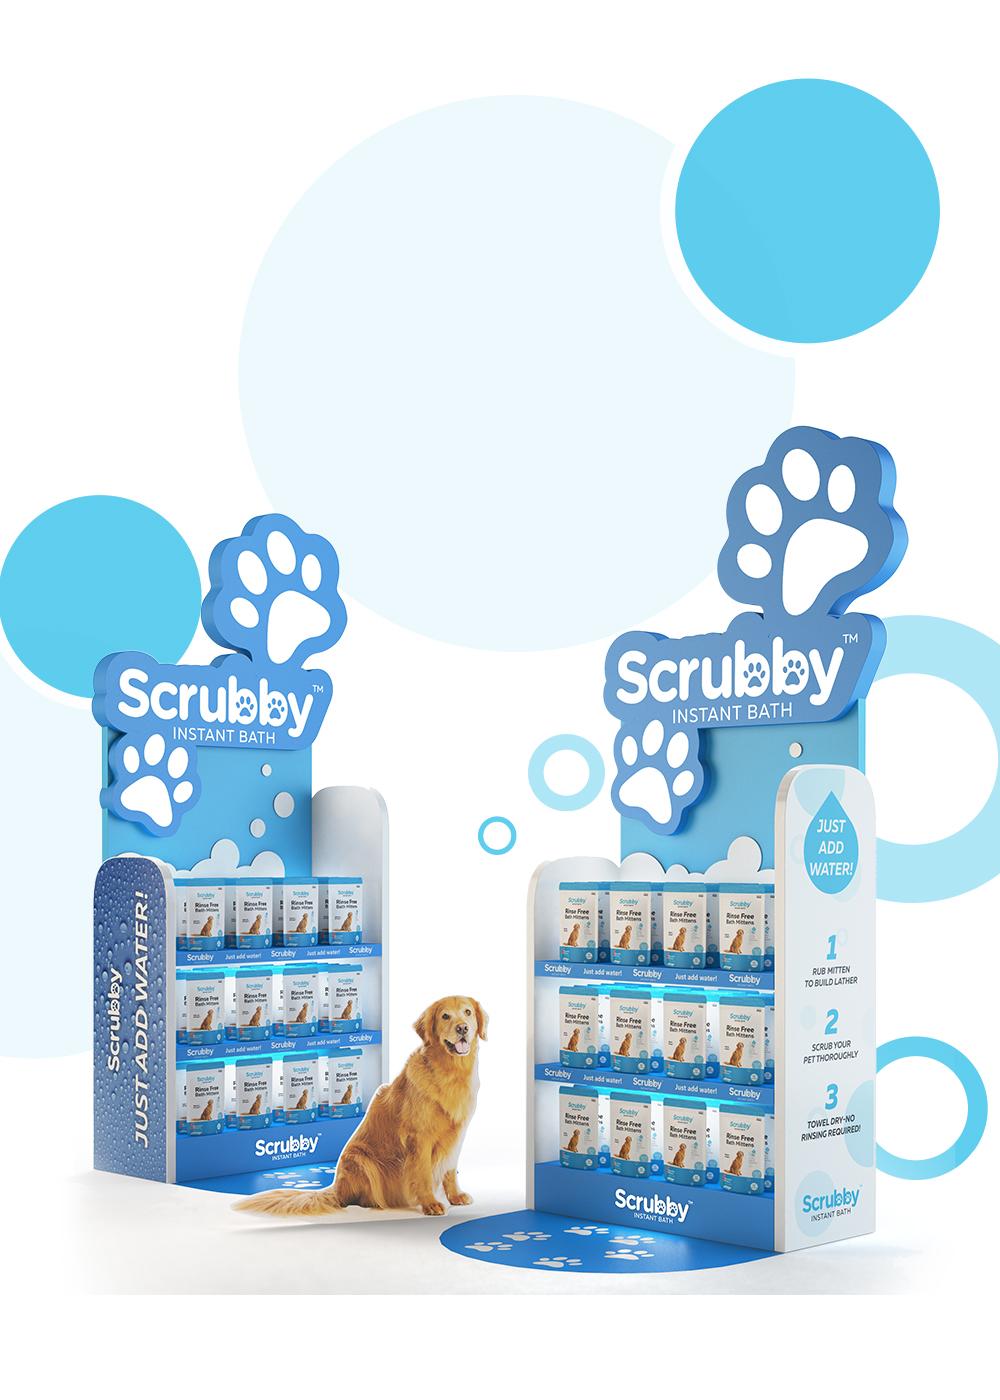 Scrubby End Cap - iDesign Branding